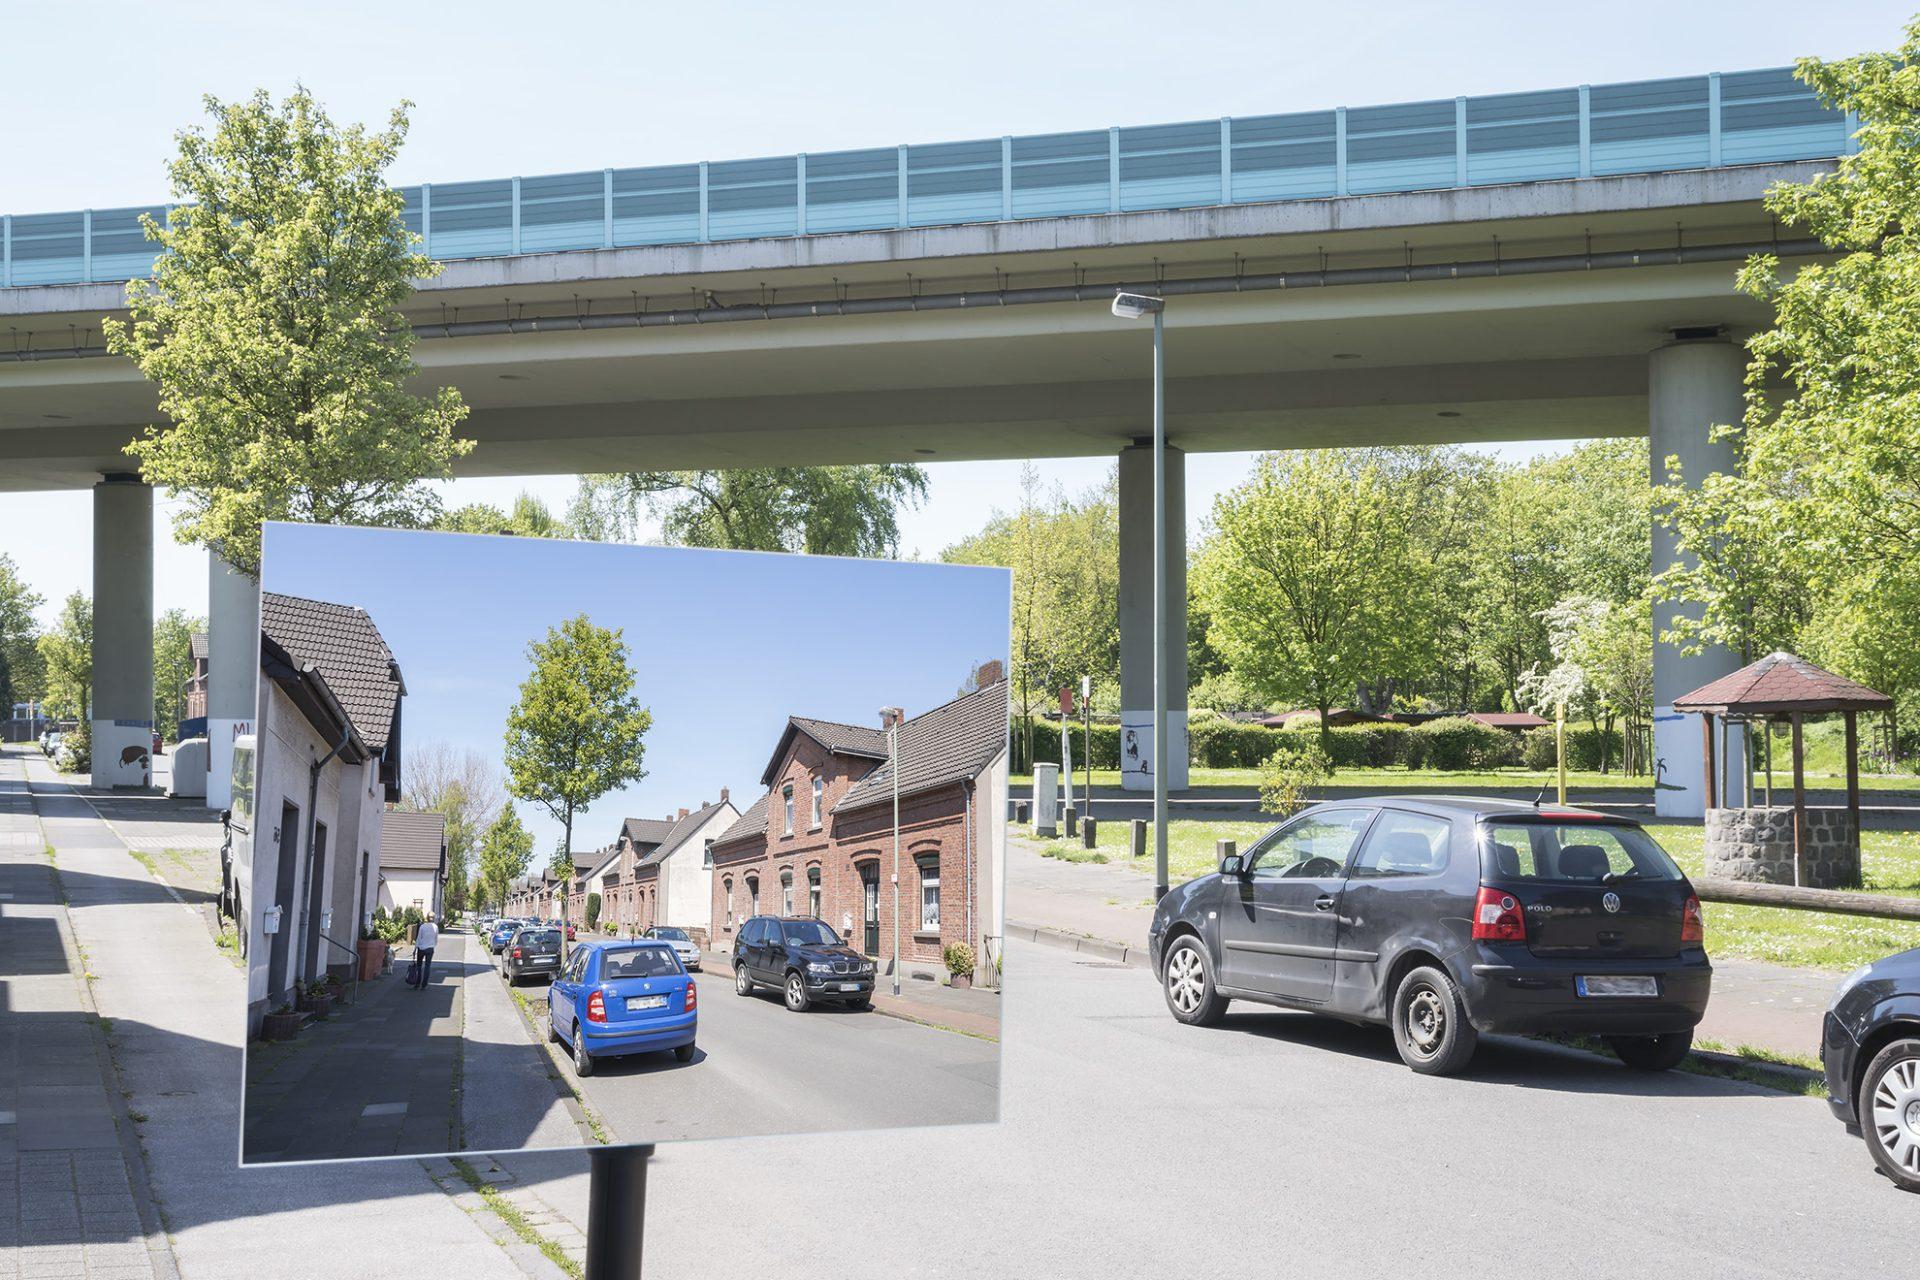 Lohstraße/Brücke A 59 • Lambda-Print auf FUJIFILM Crystal Archive DPII, 75 x 50 cm, rahmenloser Bilderhalter • Auflage: 5 + 2 Artist's Proof